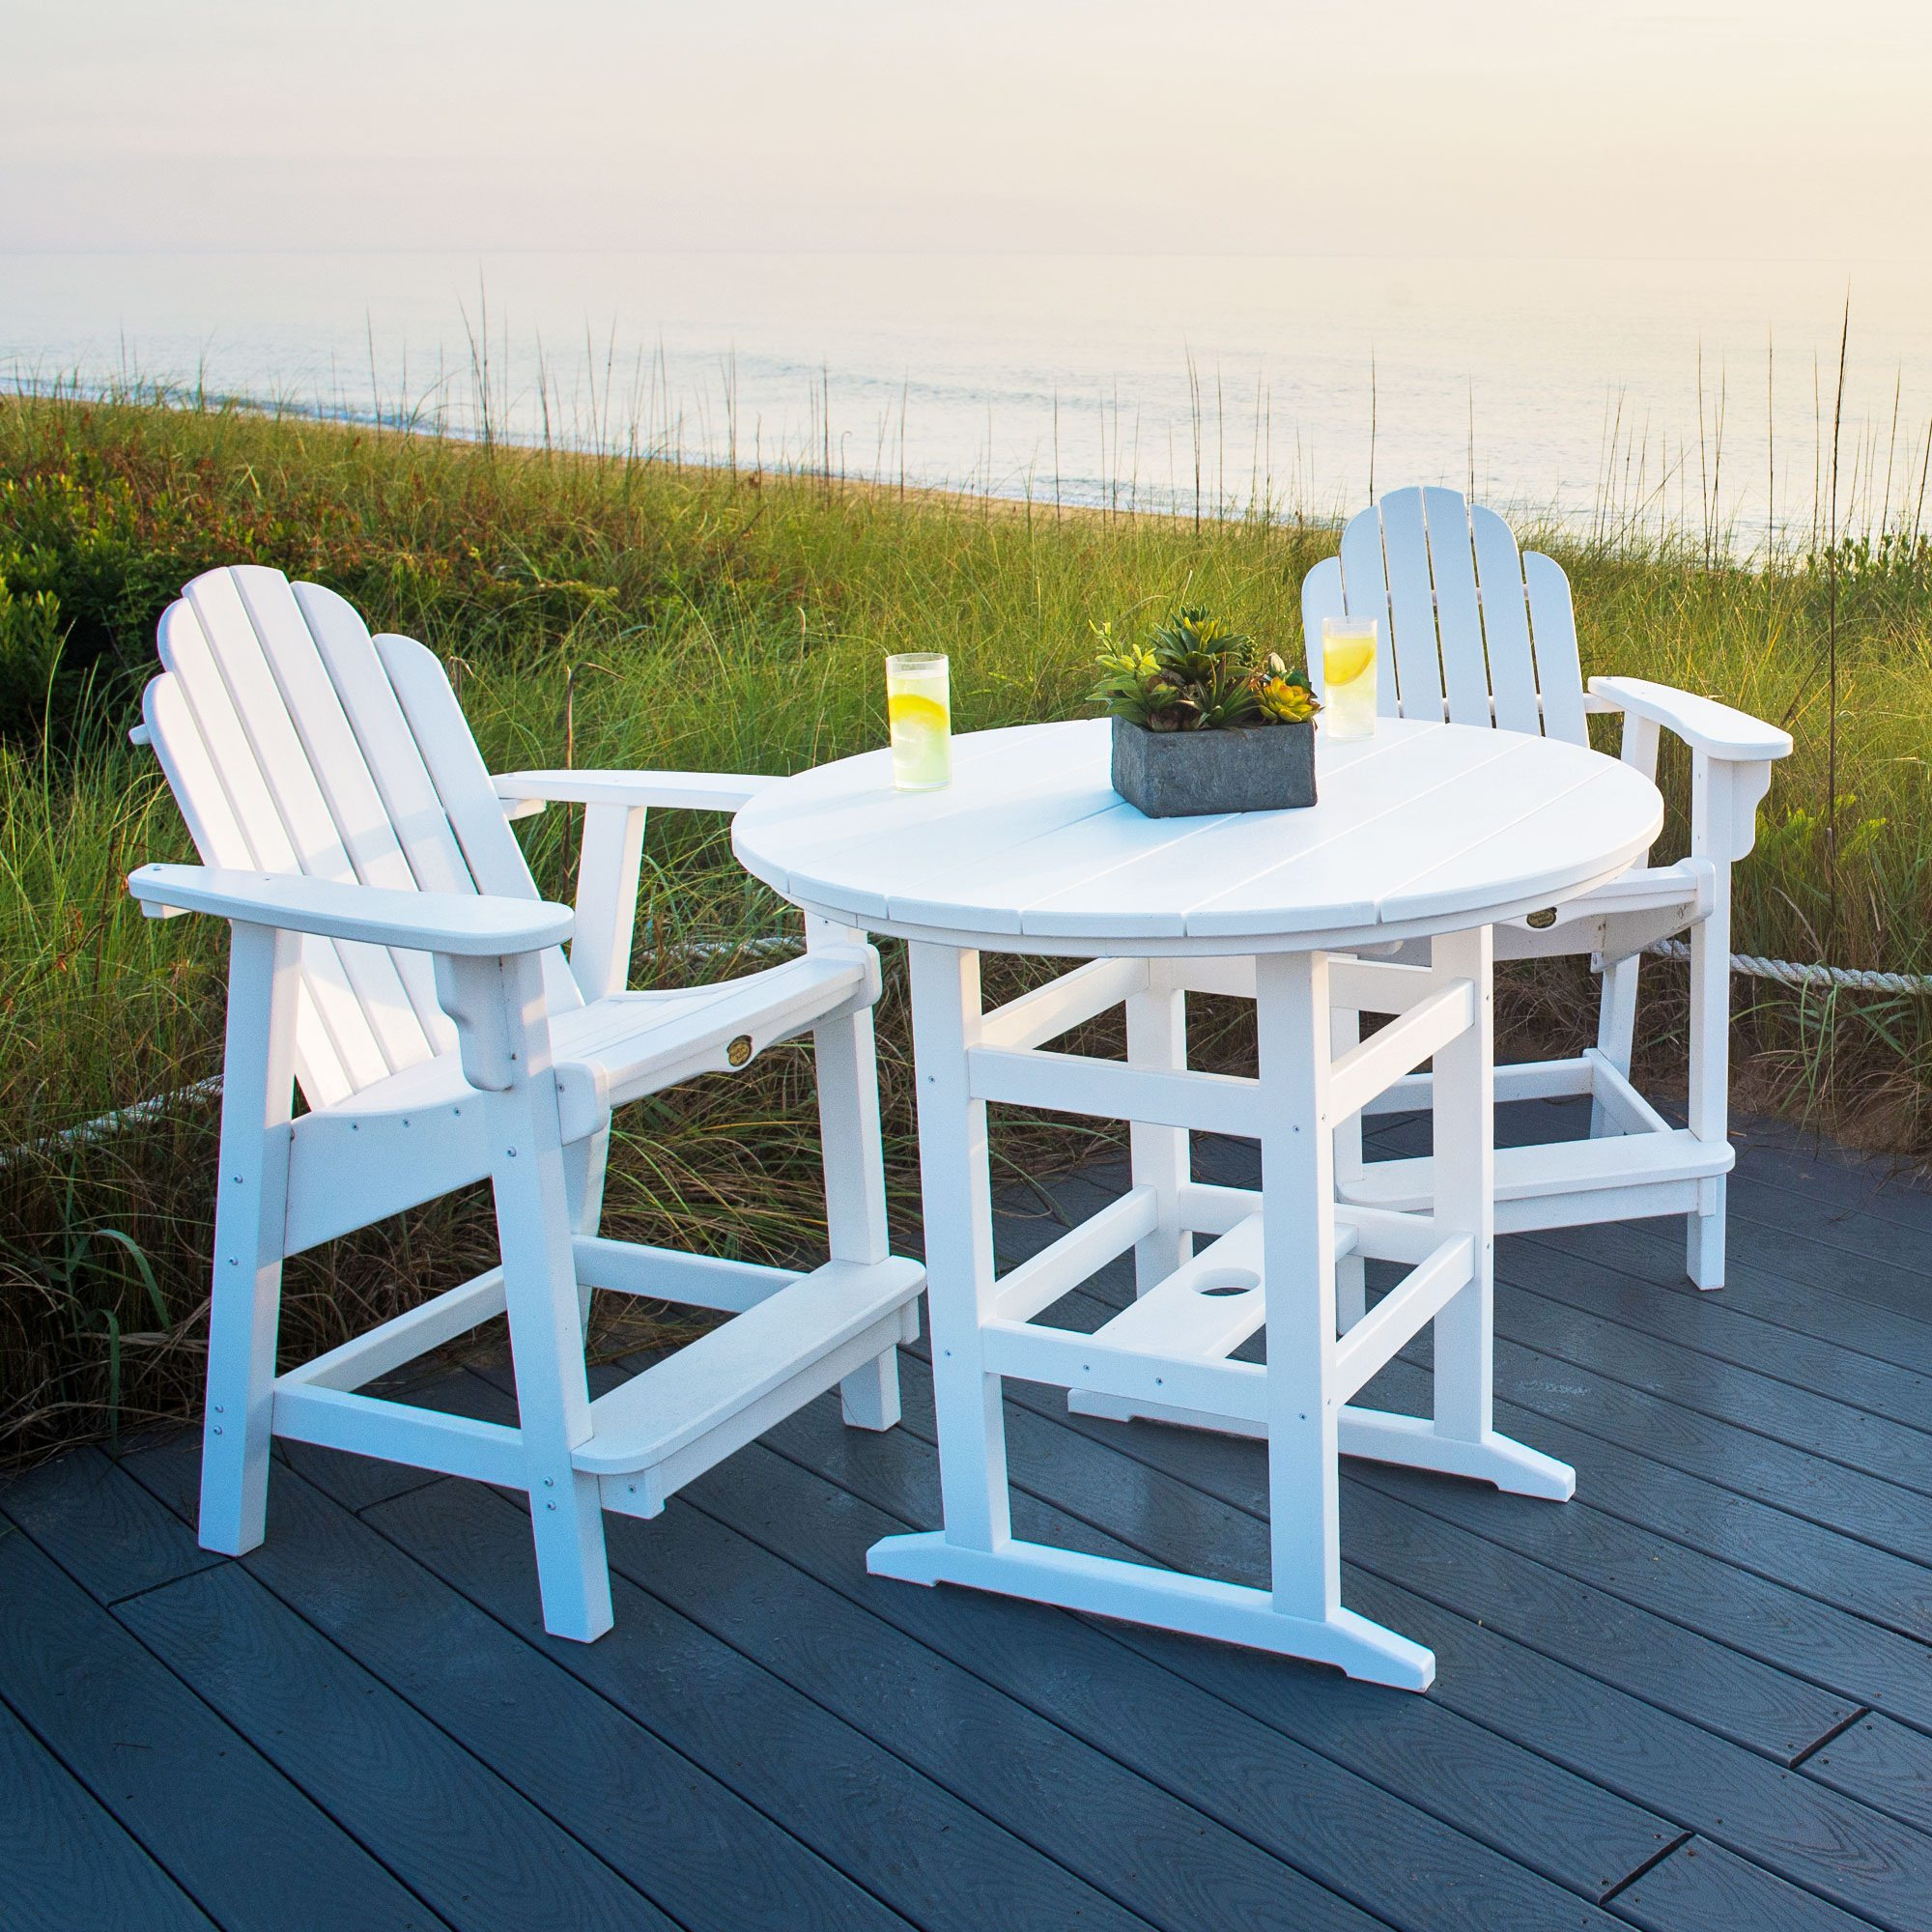 Terrific Welcome To Pawleys Island Hammocks Ibusinesslaw Wood Chair Design Ideas Ibusinesslaworg